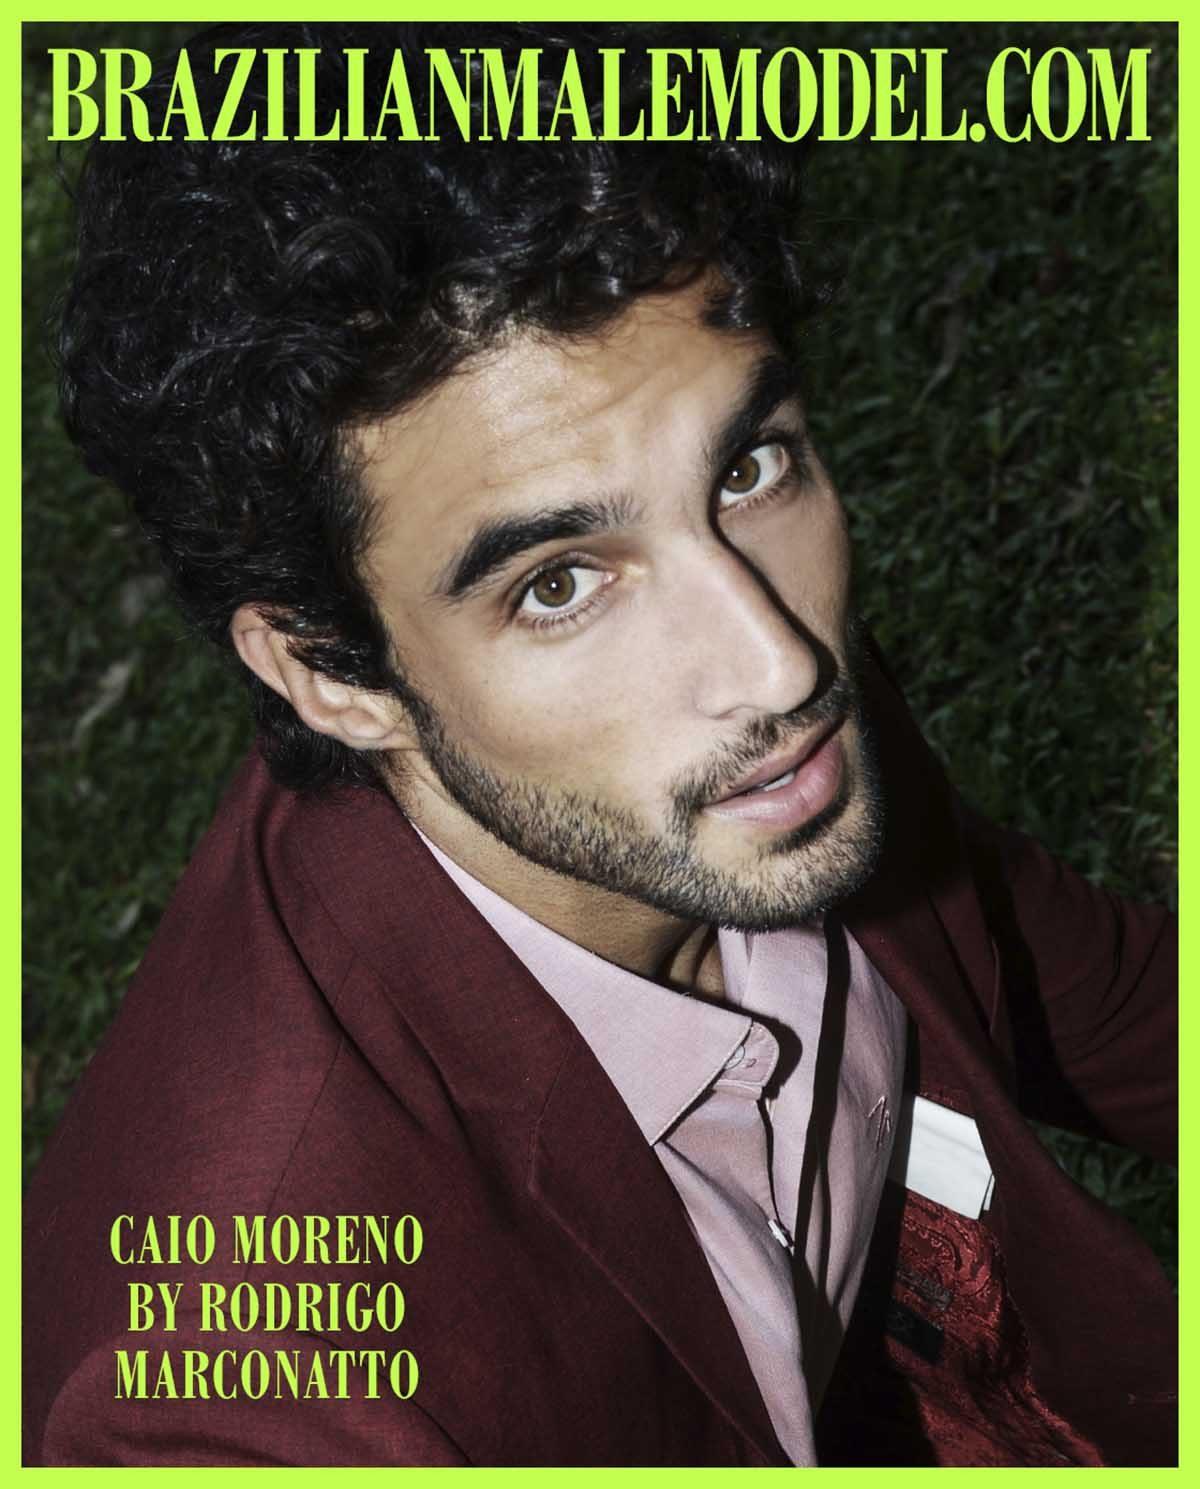 Caio Moreno by Rodrigo Marconatto